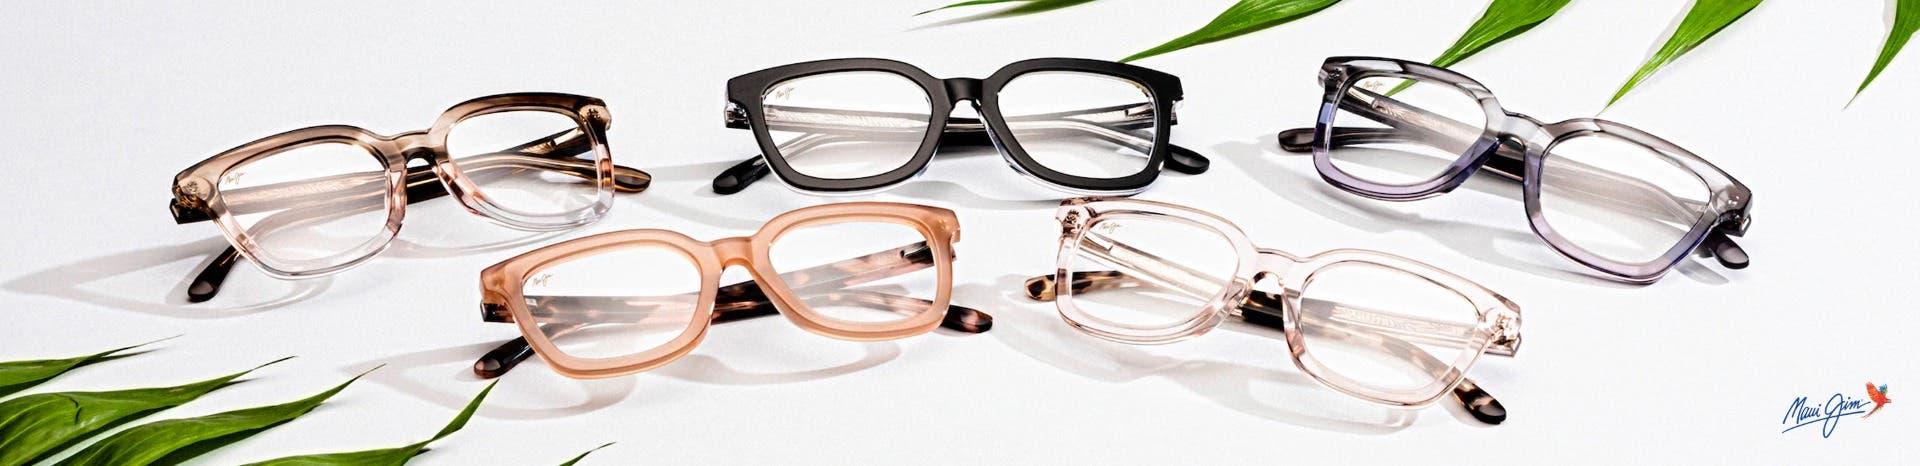 maui prescription eyeglasses